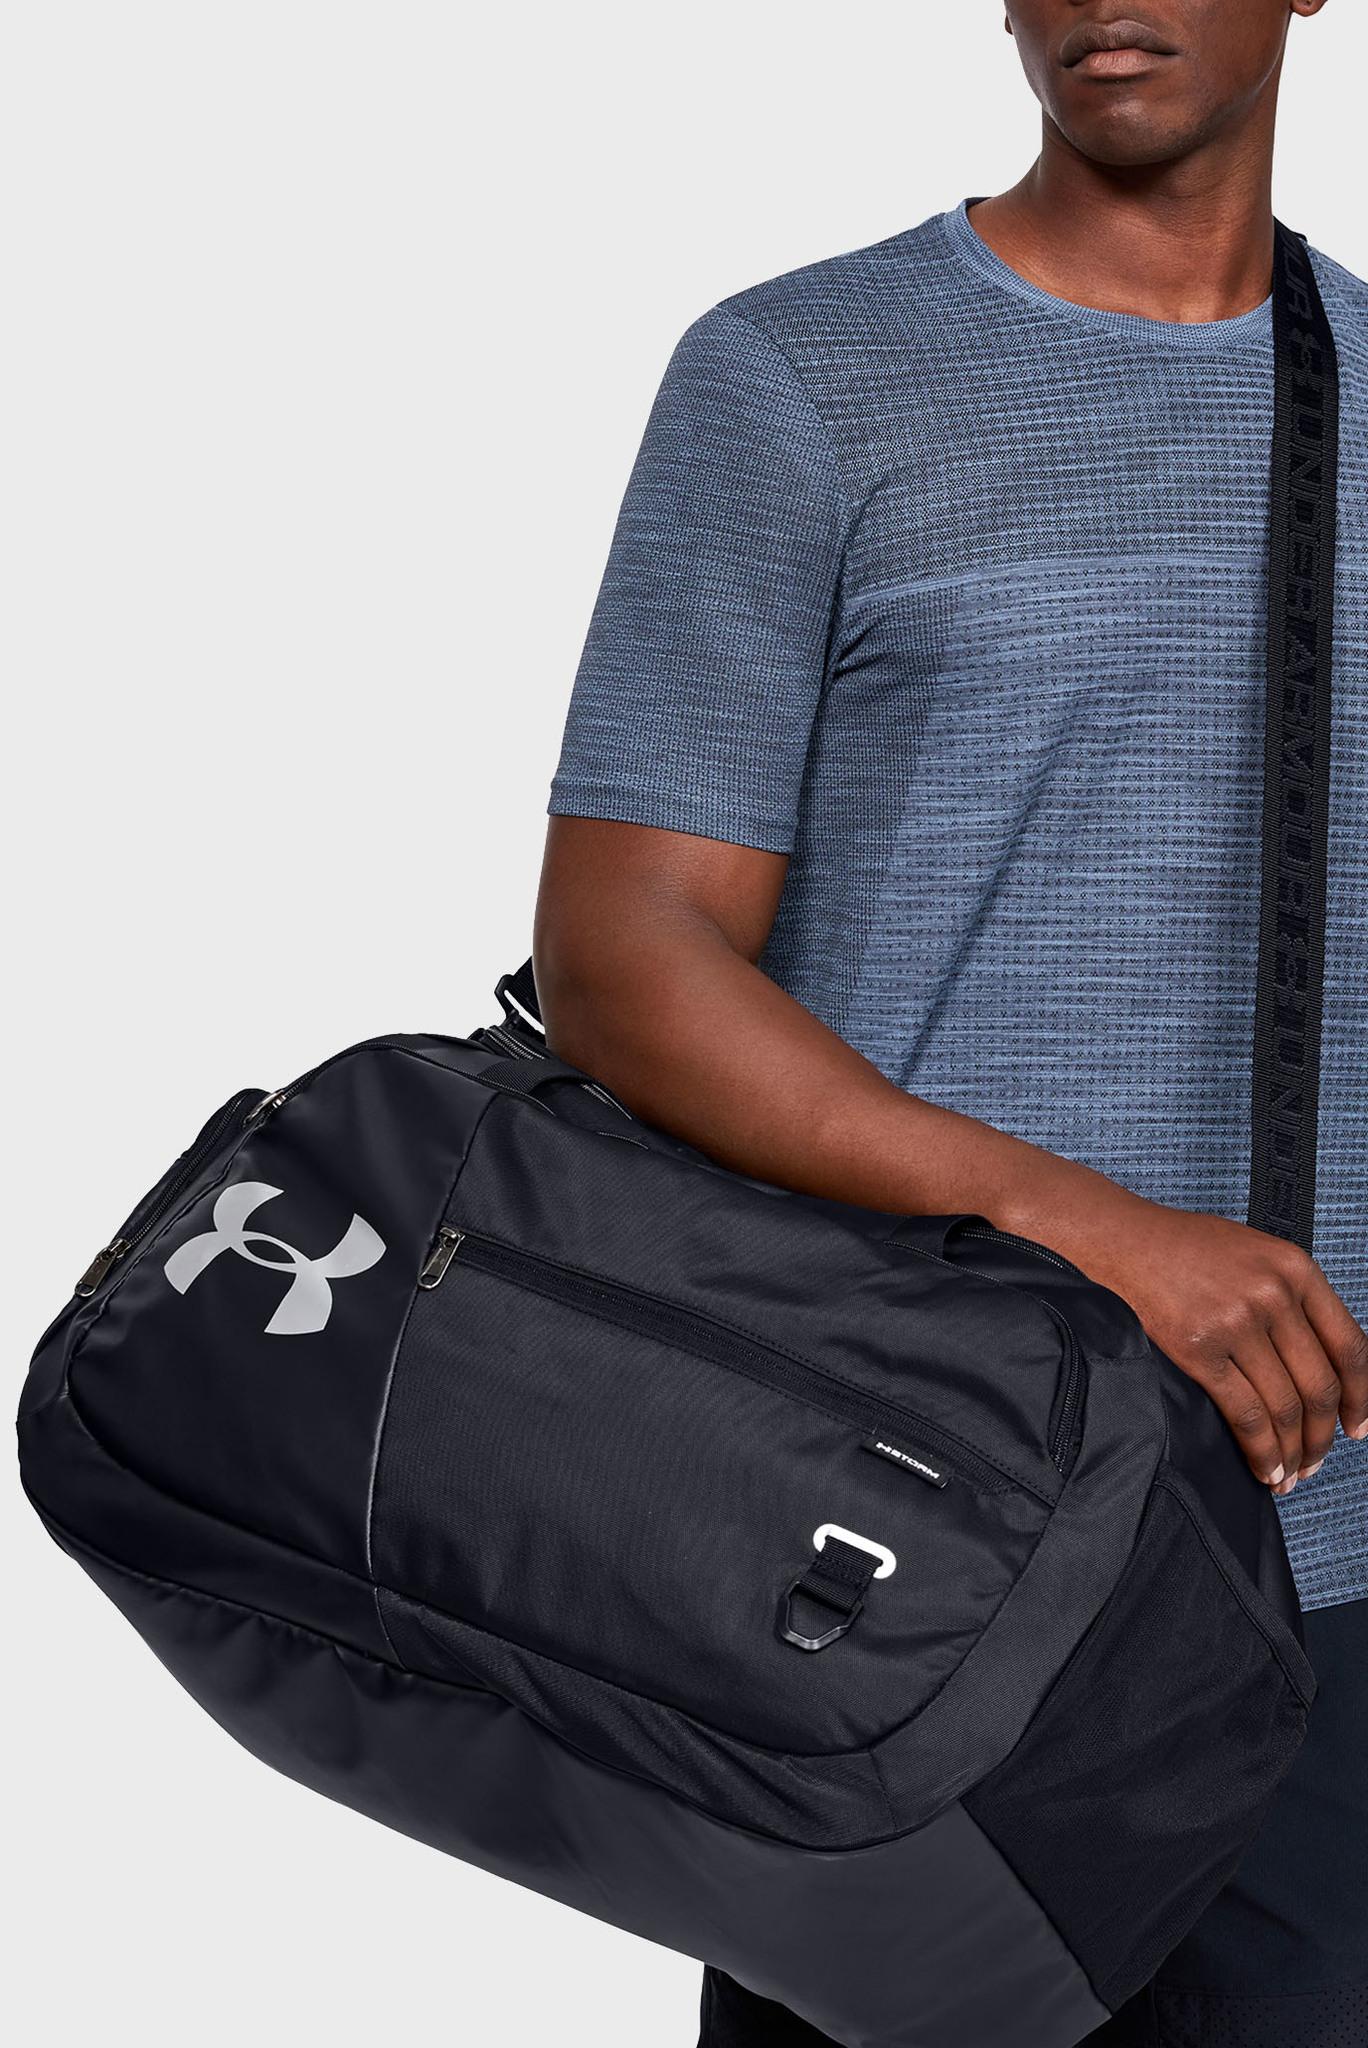 Черная спортивная сумка Undeniable Duffel 4.0 MD Under Armour